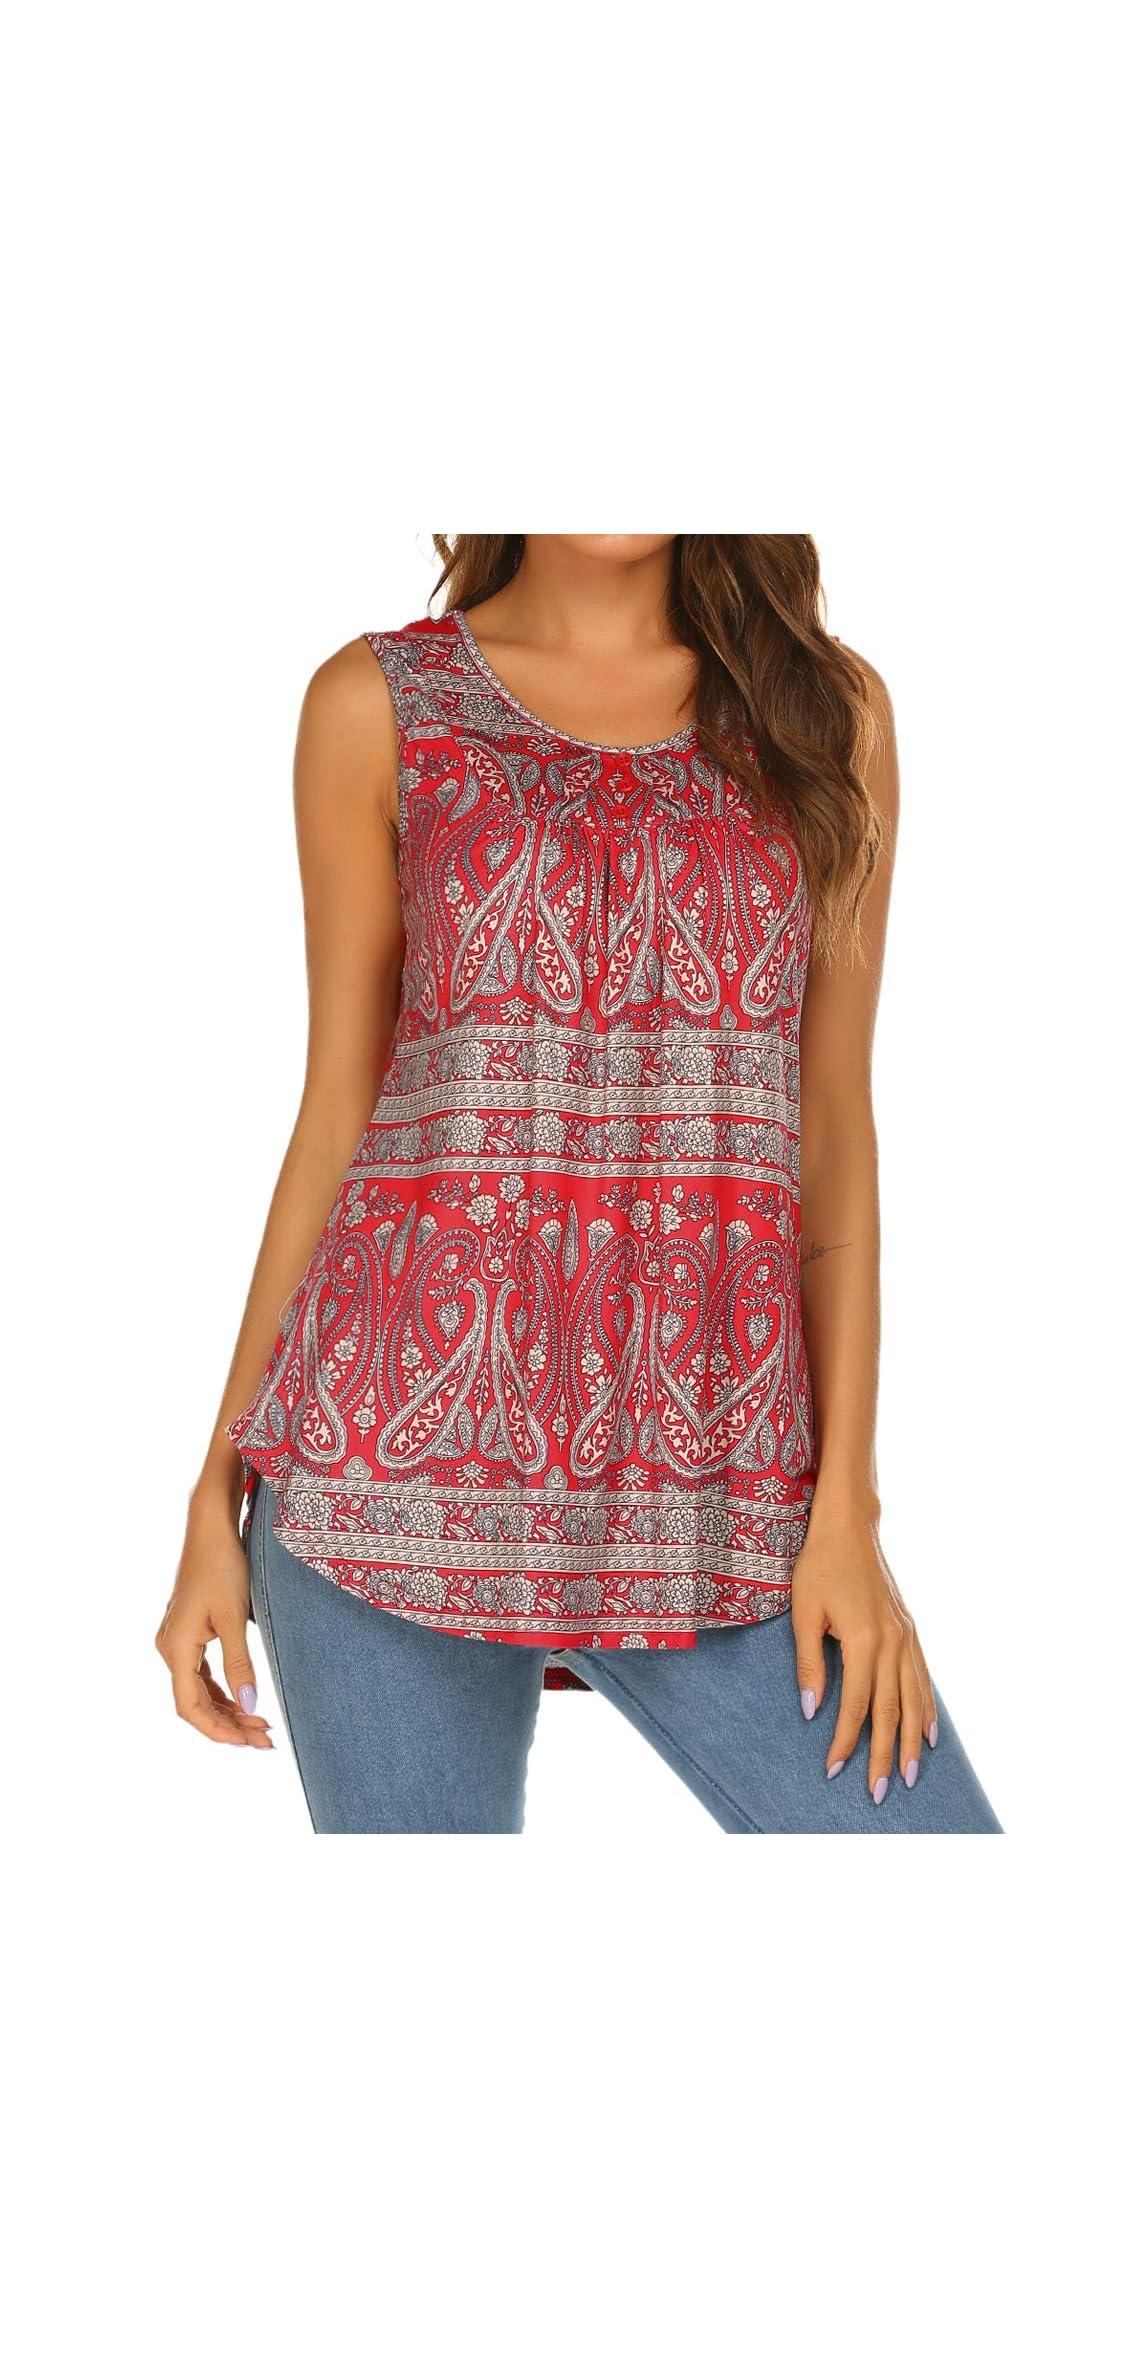 Women's Paisley Printed Pleated Sleeveless Blouse Shirt